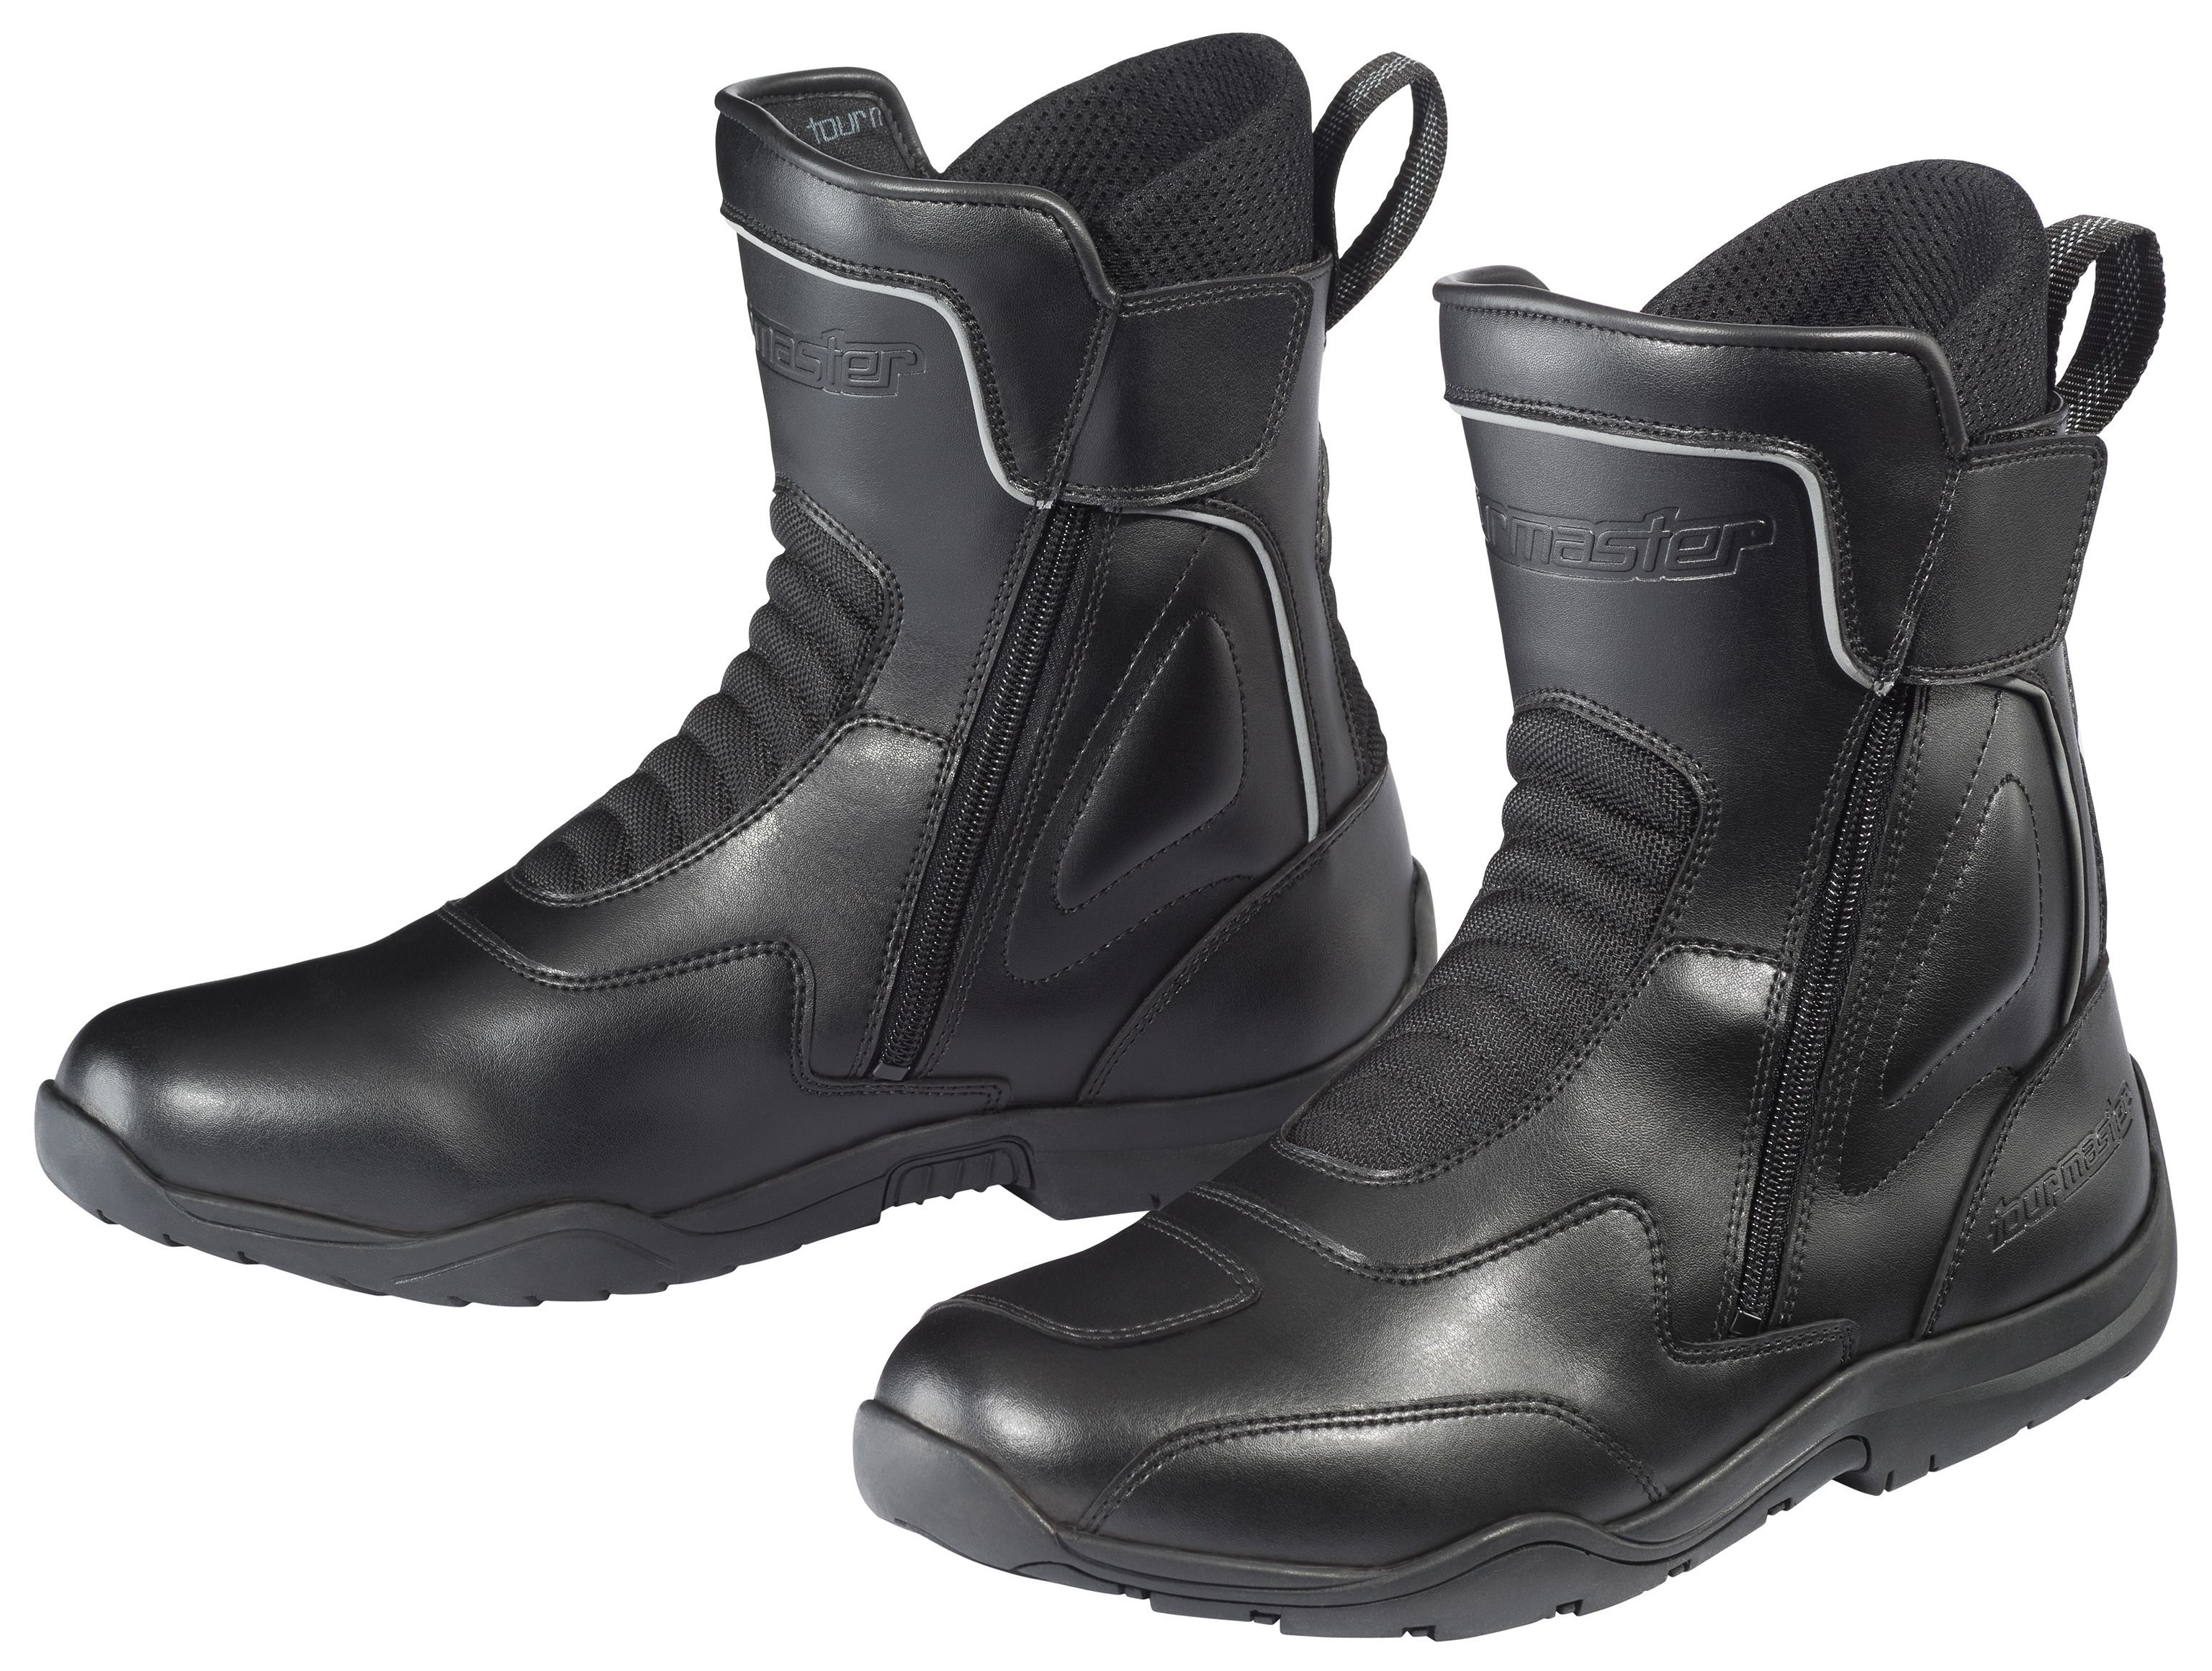 daytona road star gtx boots cycle gear. Black Bedroom Furniture Sets. Home Design Ideas